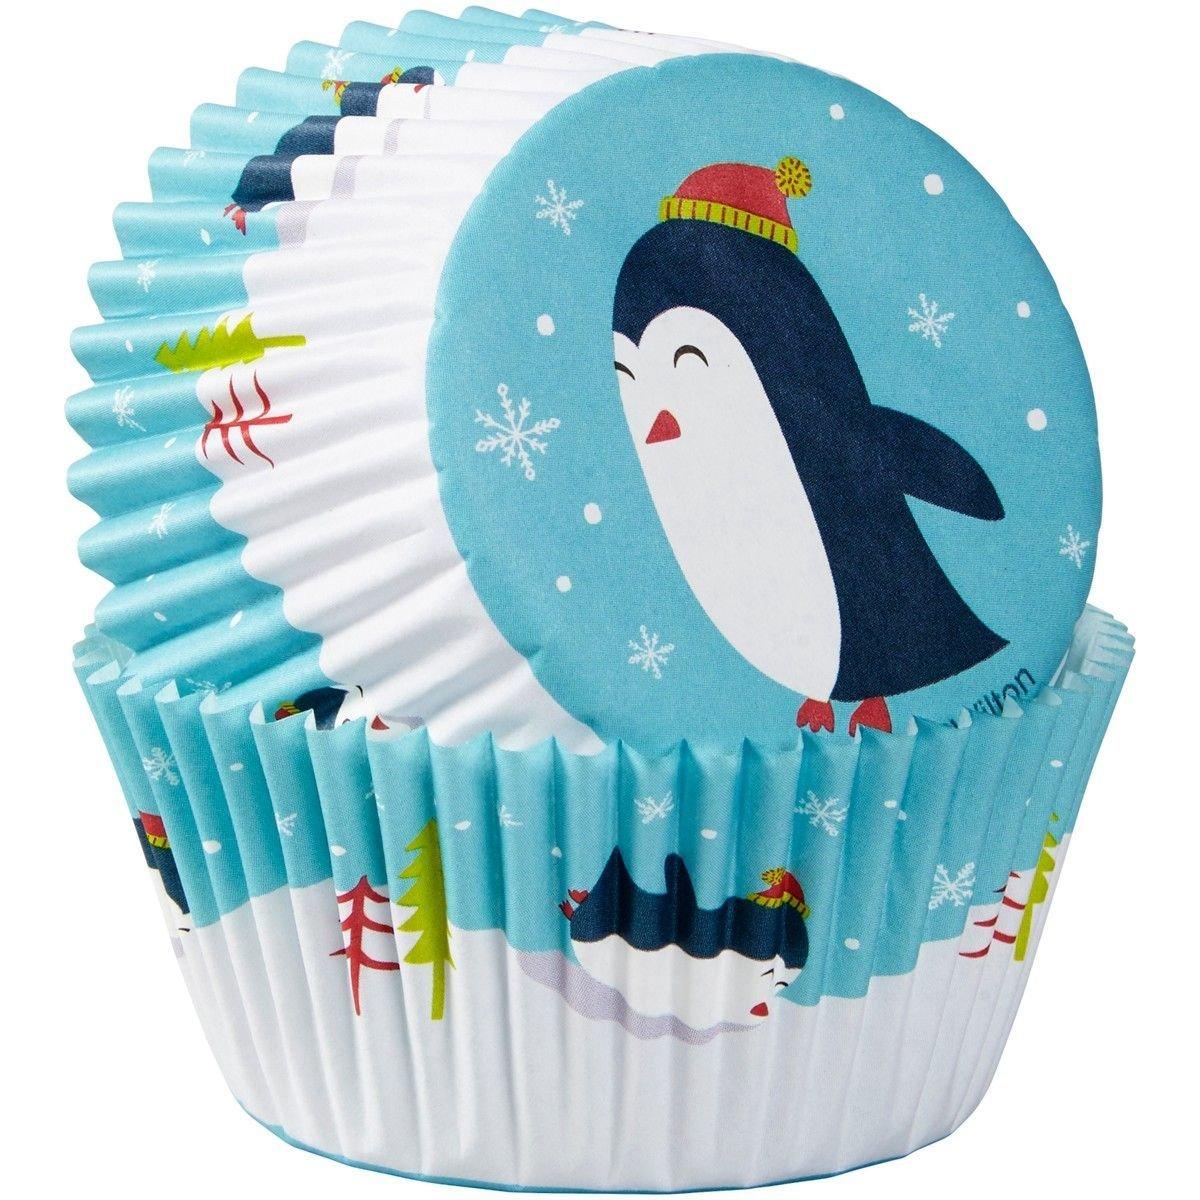 Wilton Christmas Cupcake Cases -PENGUINS - Θήκες ψησίματος Πιγκουίνος 75 τεμ